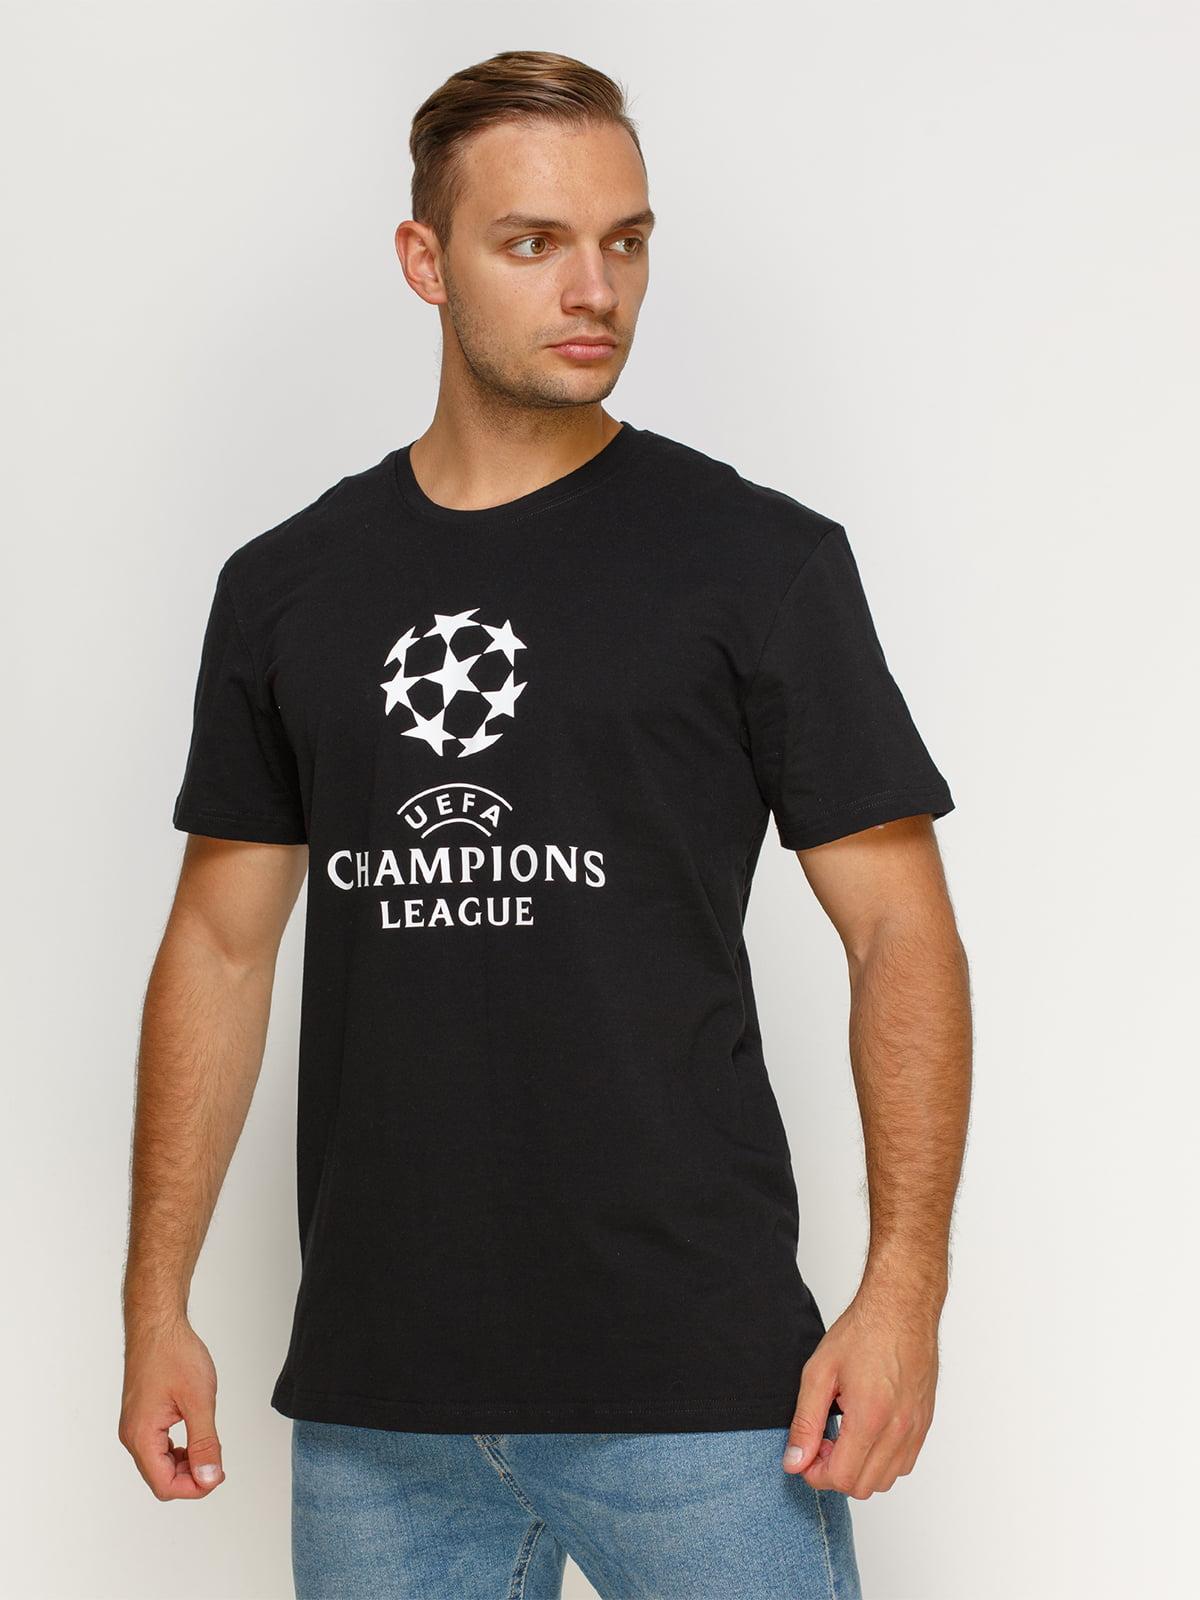 Футболка чорна з принтом   4577907